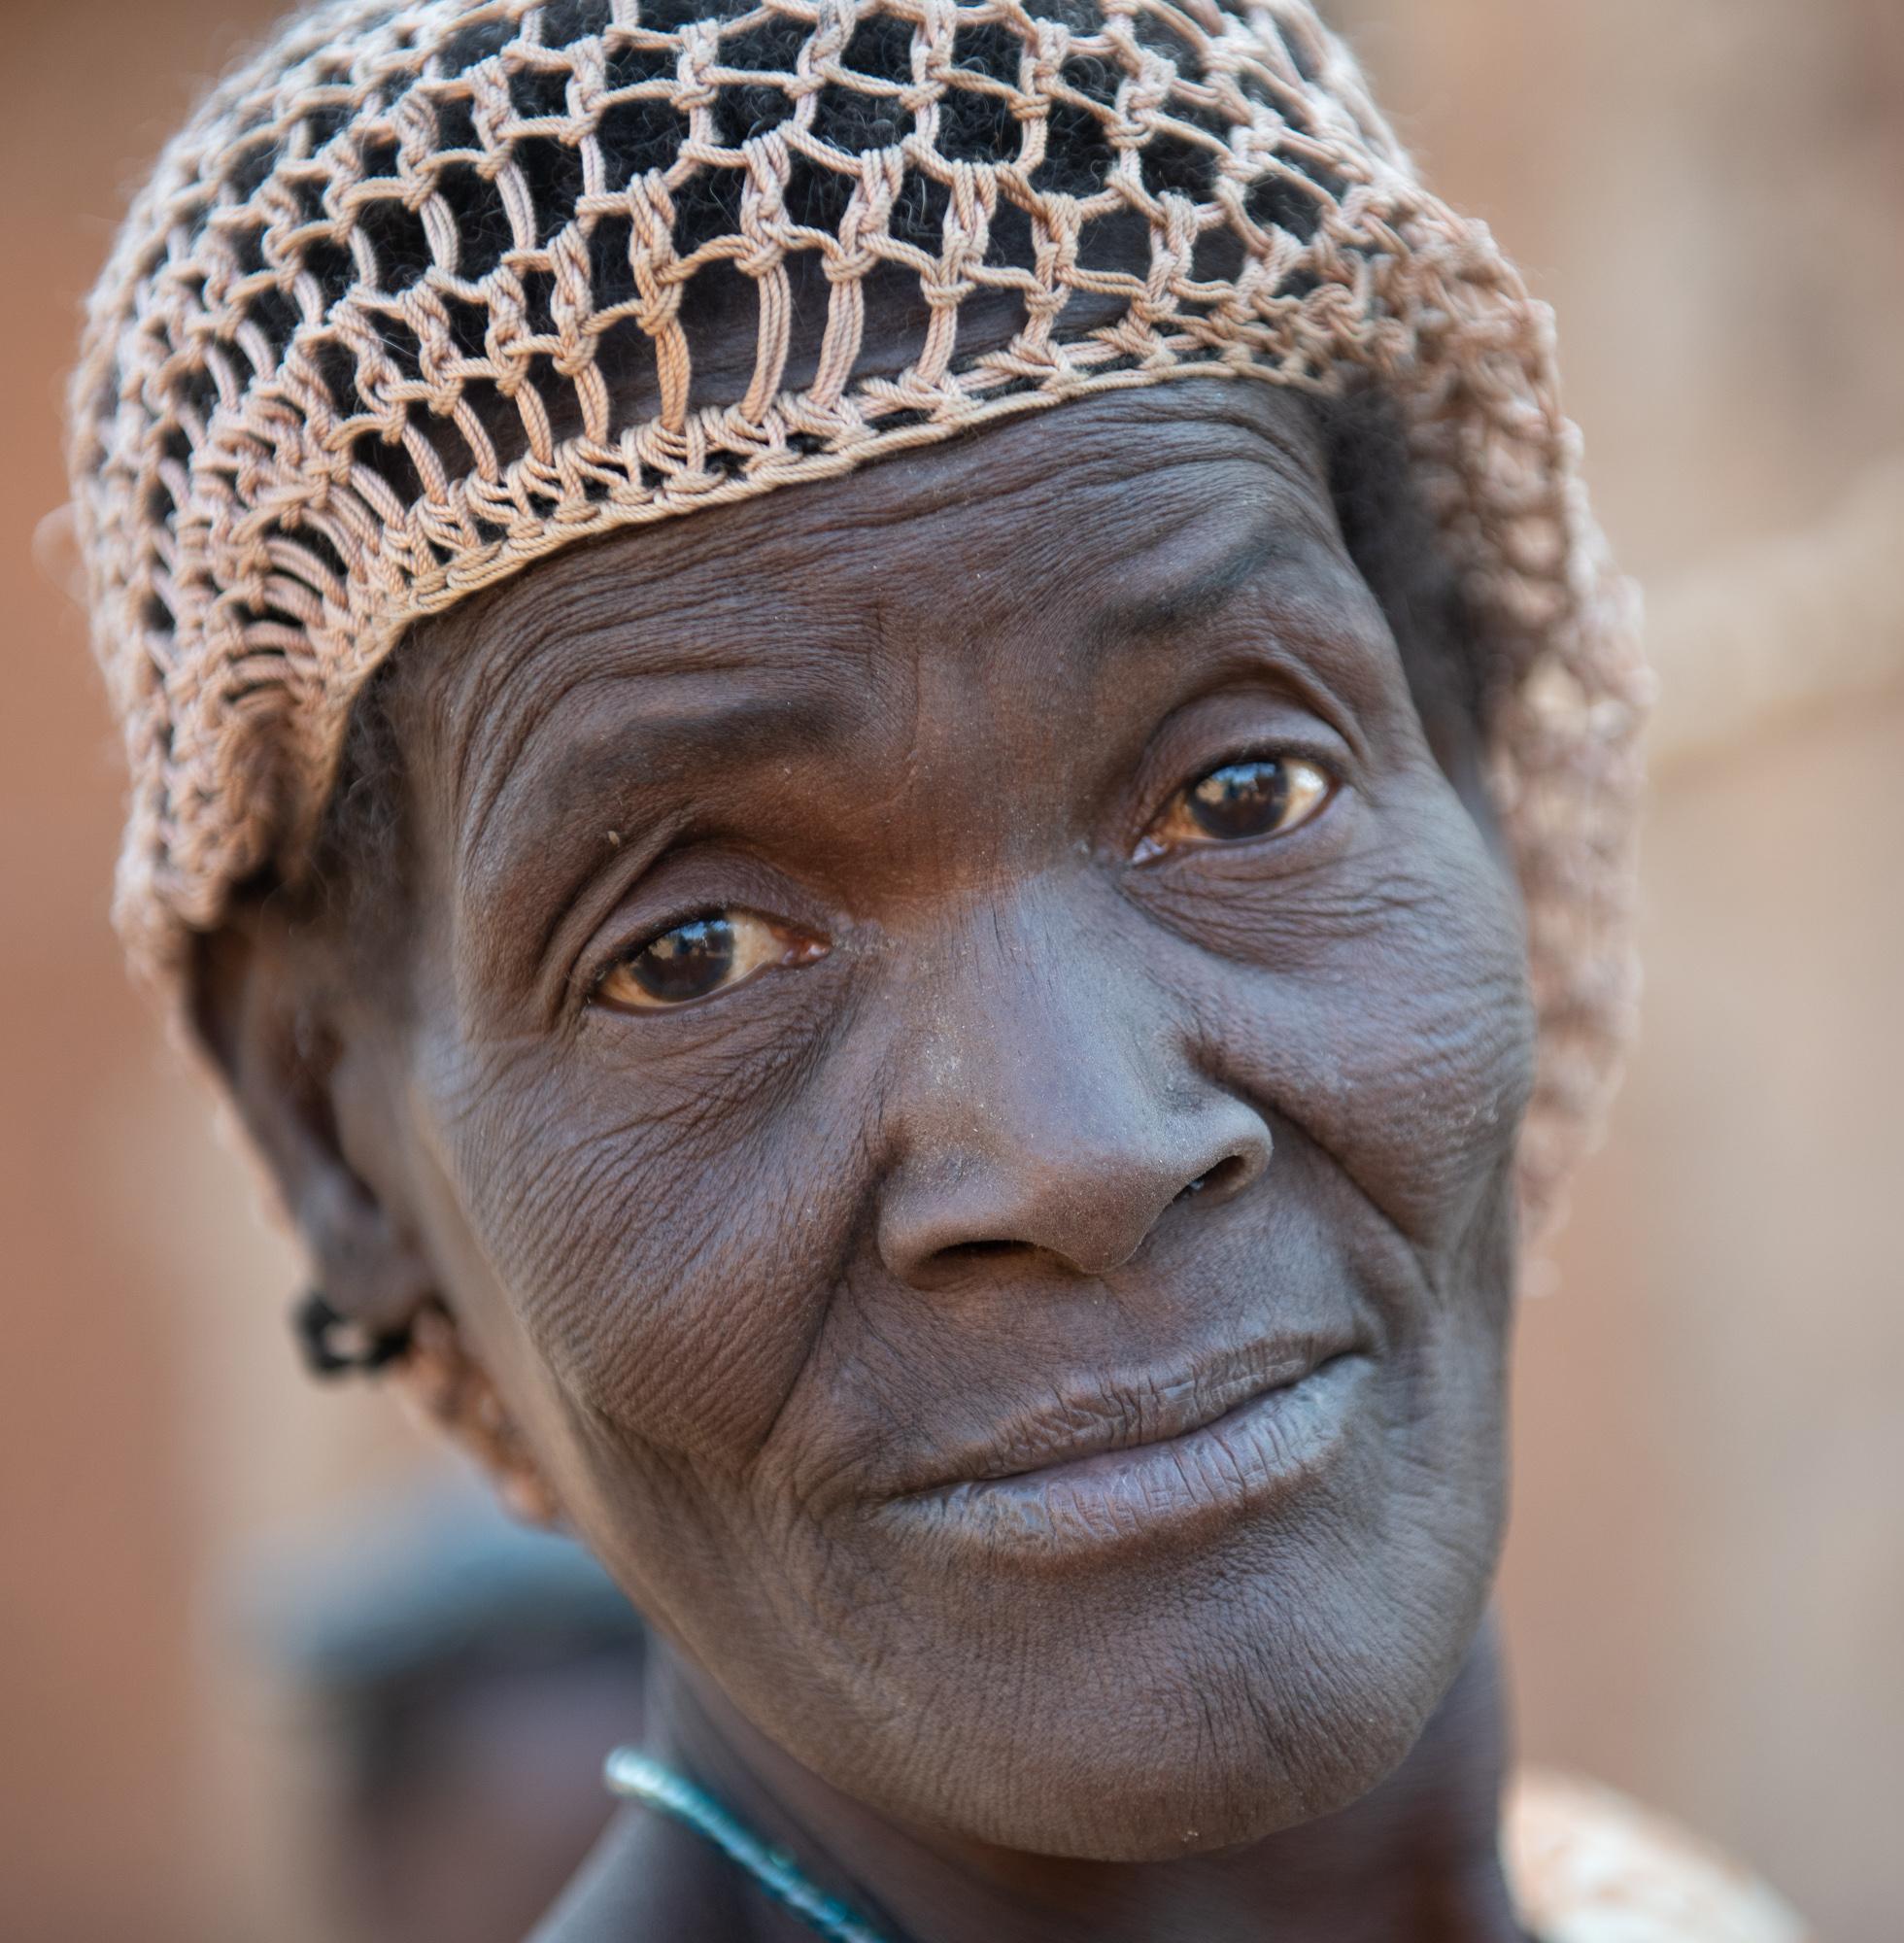 Village Woman, Benin